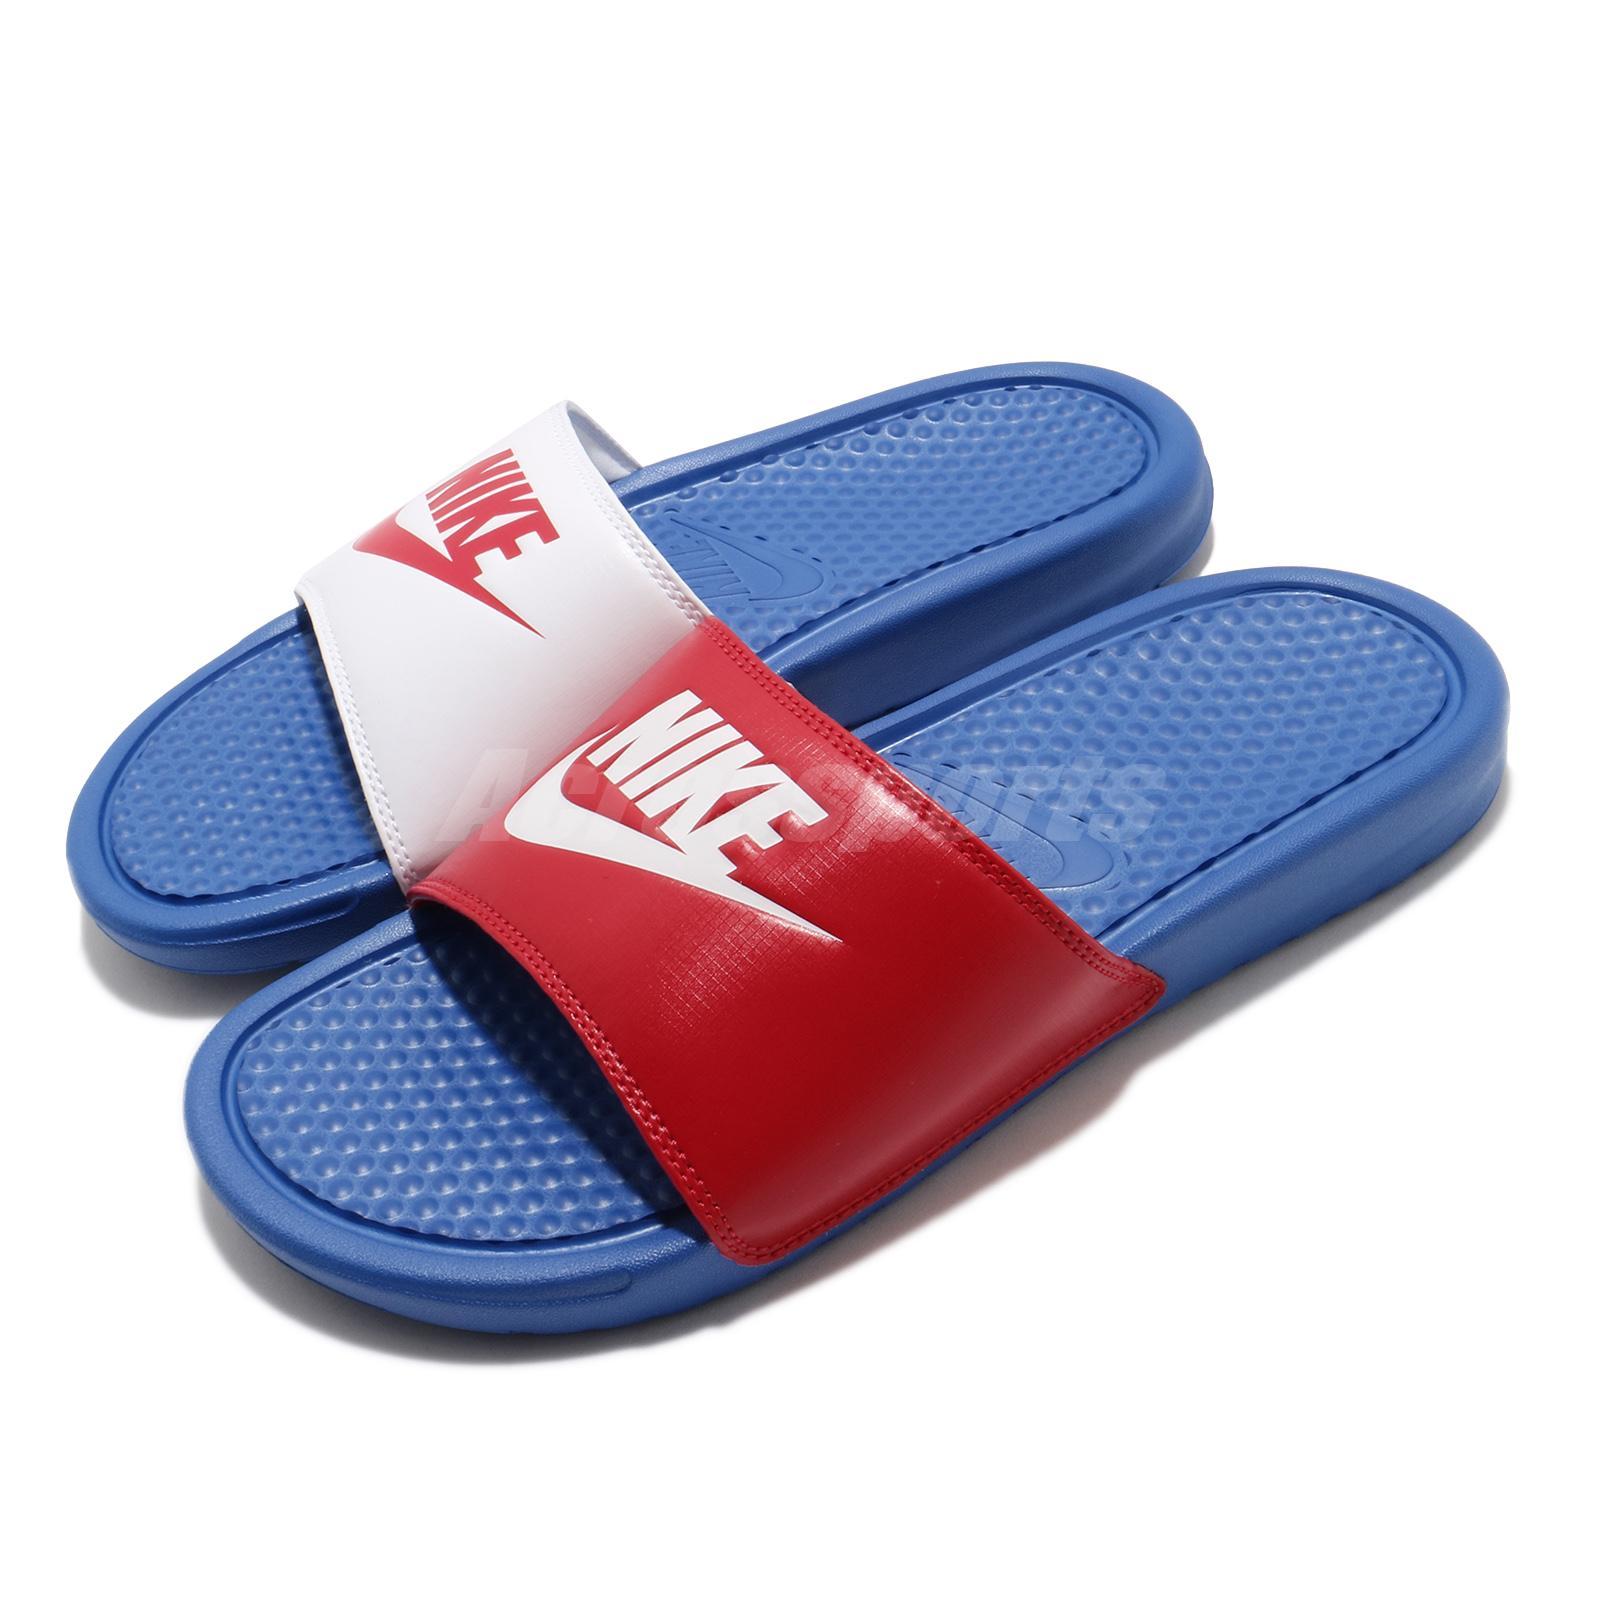 algun lado herramienta estoy enfermo  Nike Benassi JDI Game Royal Blue Red White Men Sandals Slides Slipper  343880-415 | eBay